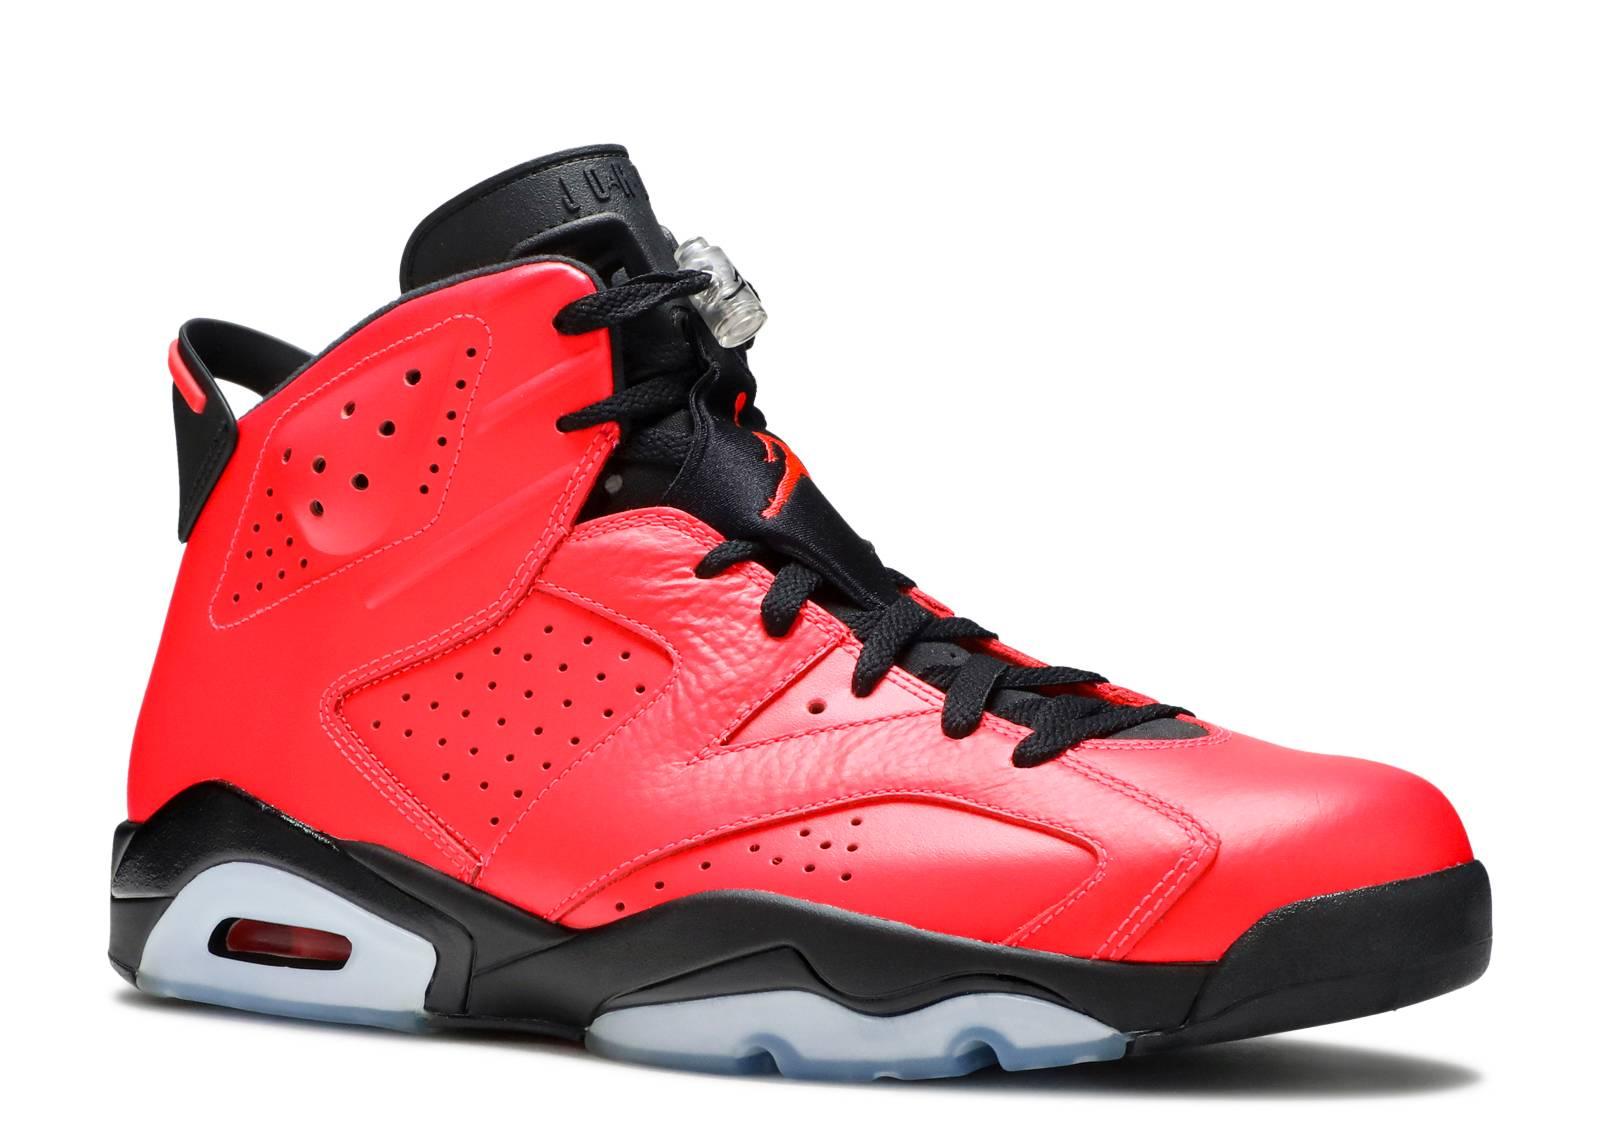 Jordan 6 Infrared 23